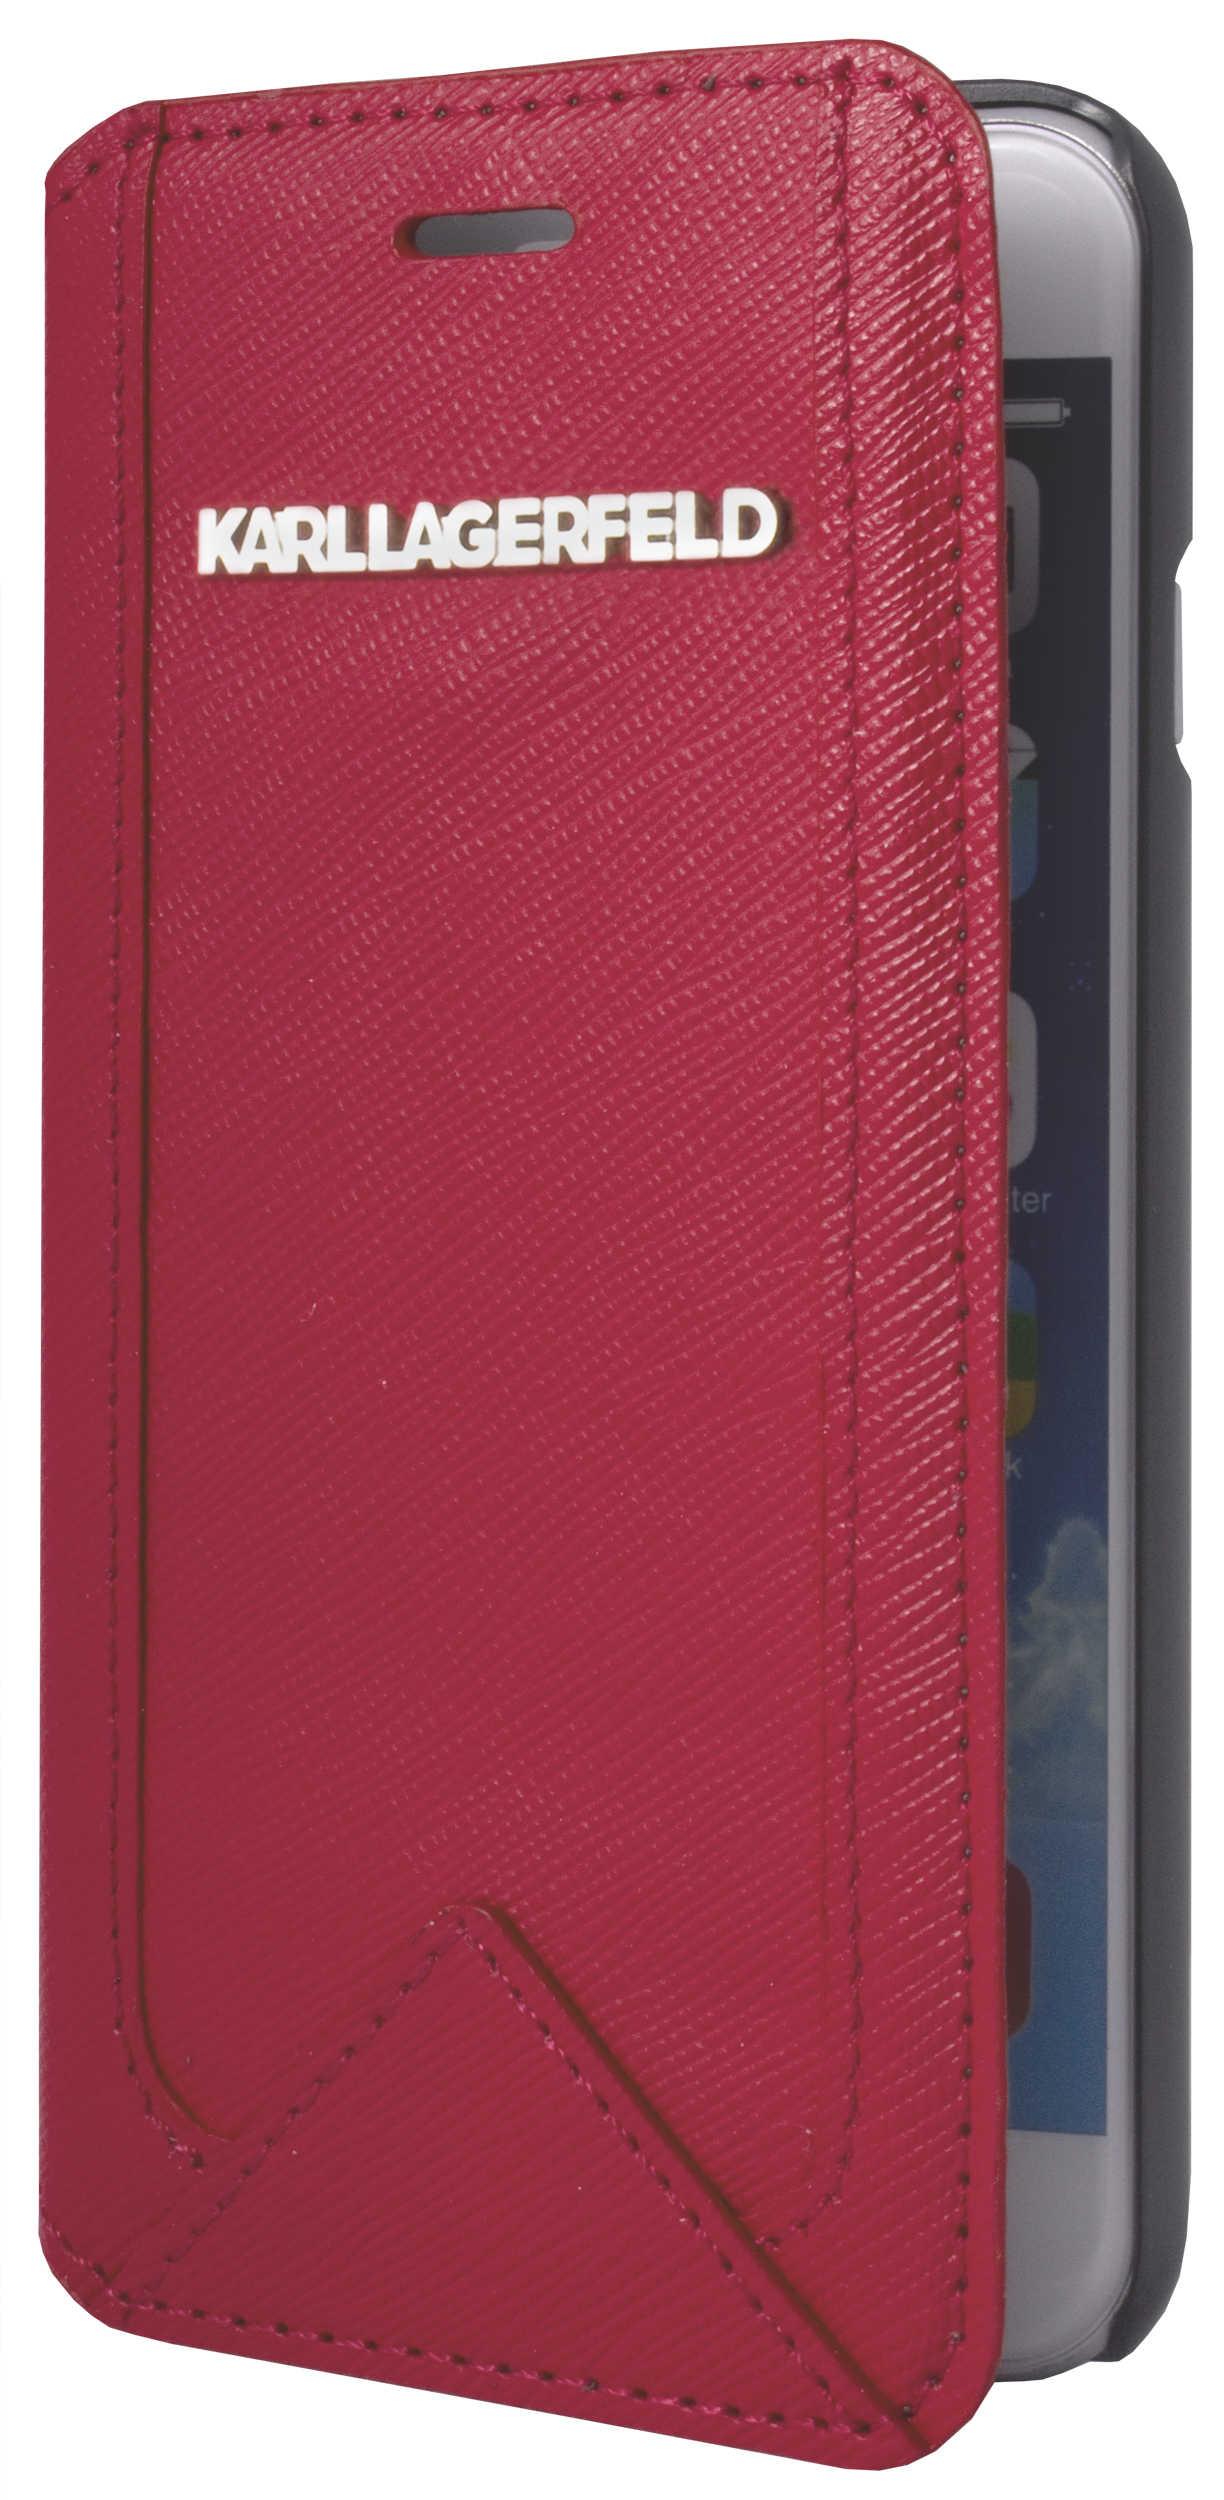 Folio Karl Lagerfeld Iphone 6 Rose